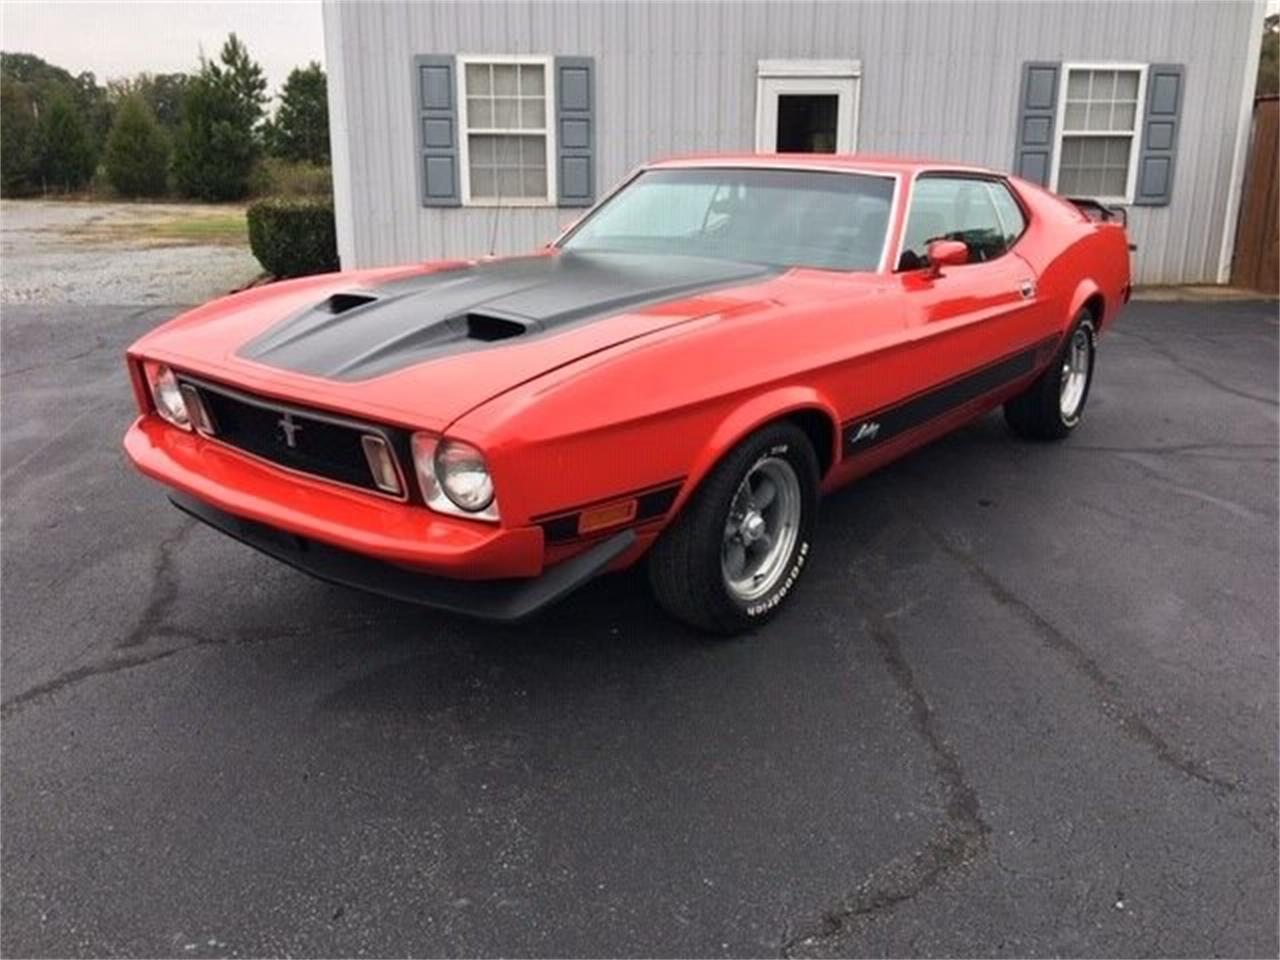 1973 Ford Mustang (CC-1413688) for sale in Greensboro, North Carolina